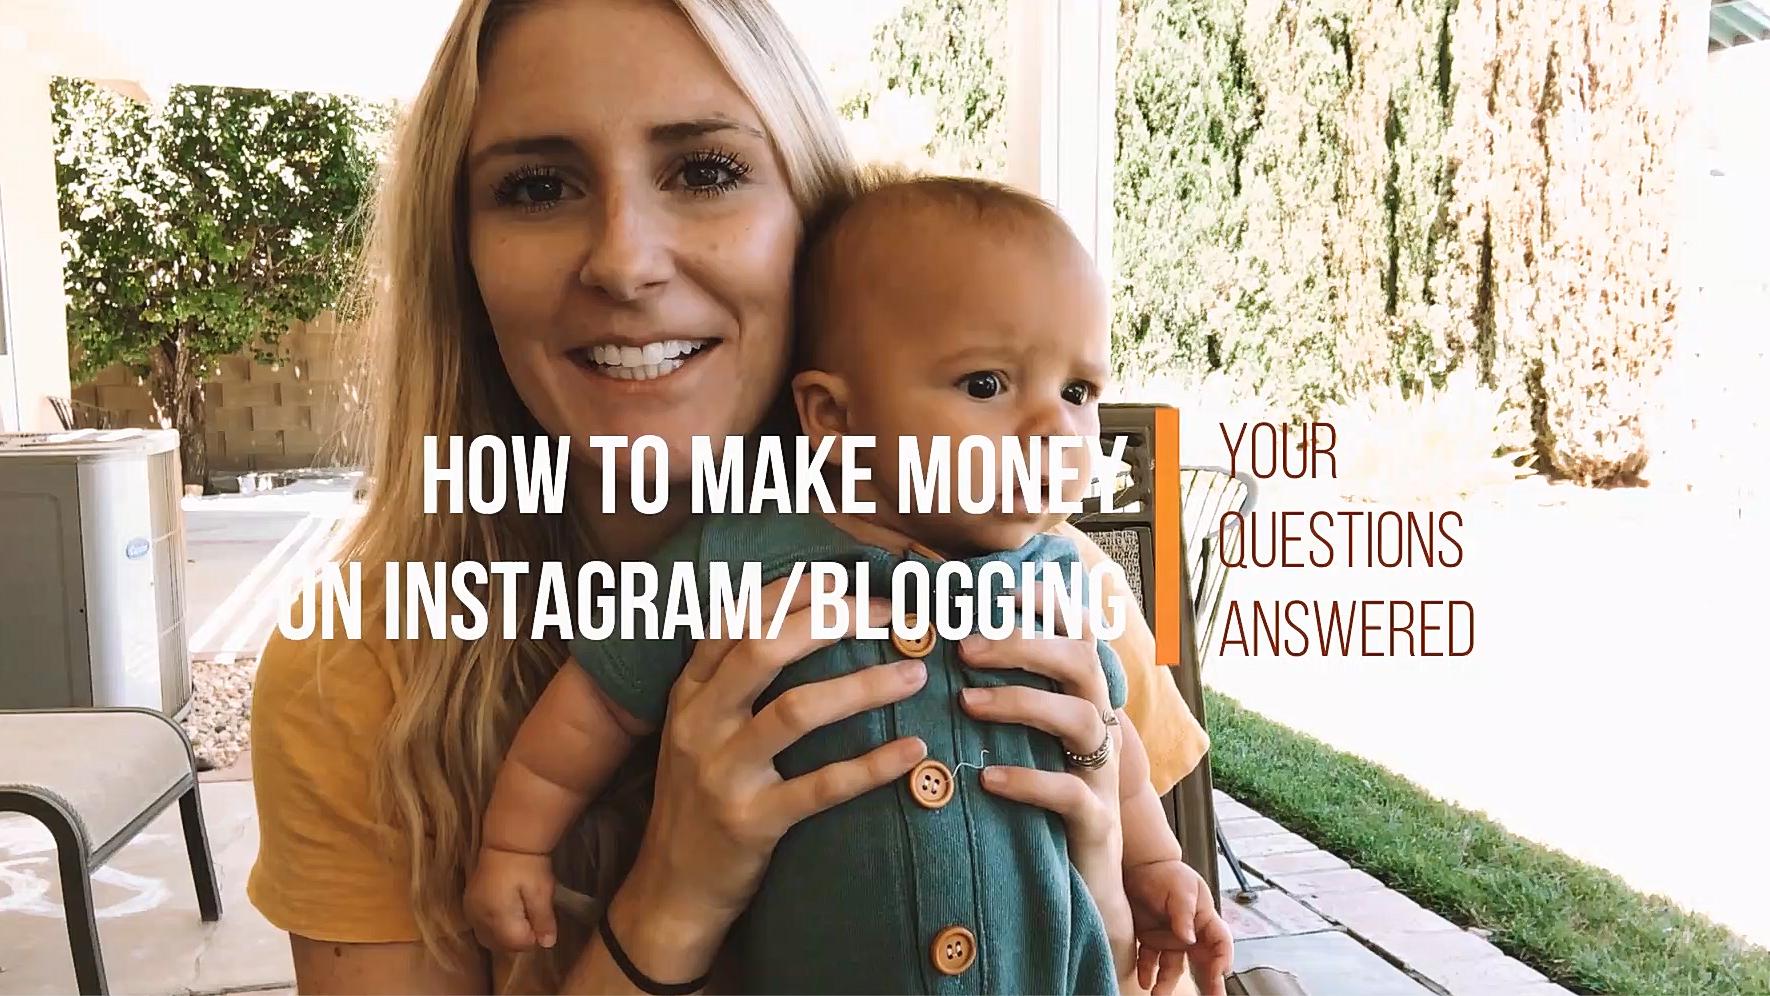 How to make money/ a living on Instagram + Blogging - The Overwhelmed Mommy Blogger